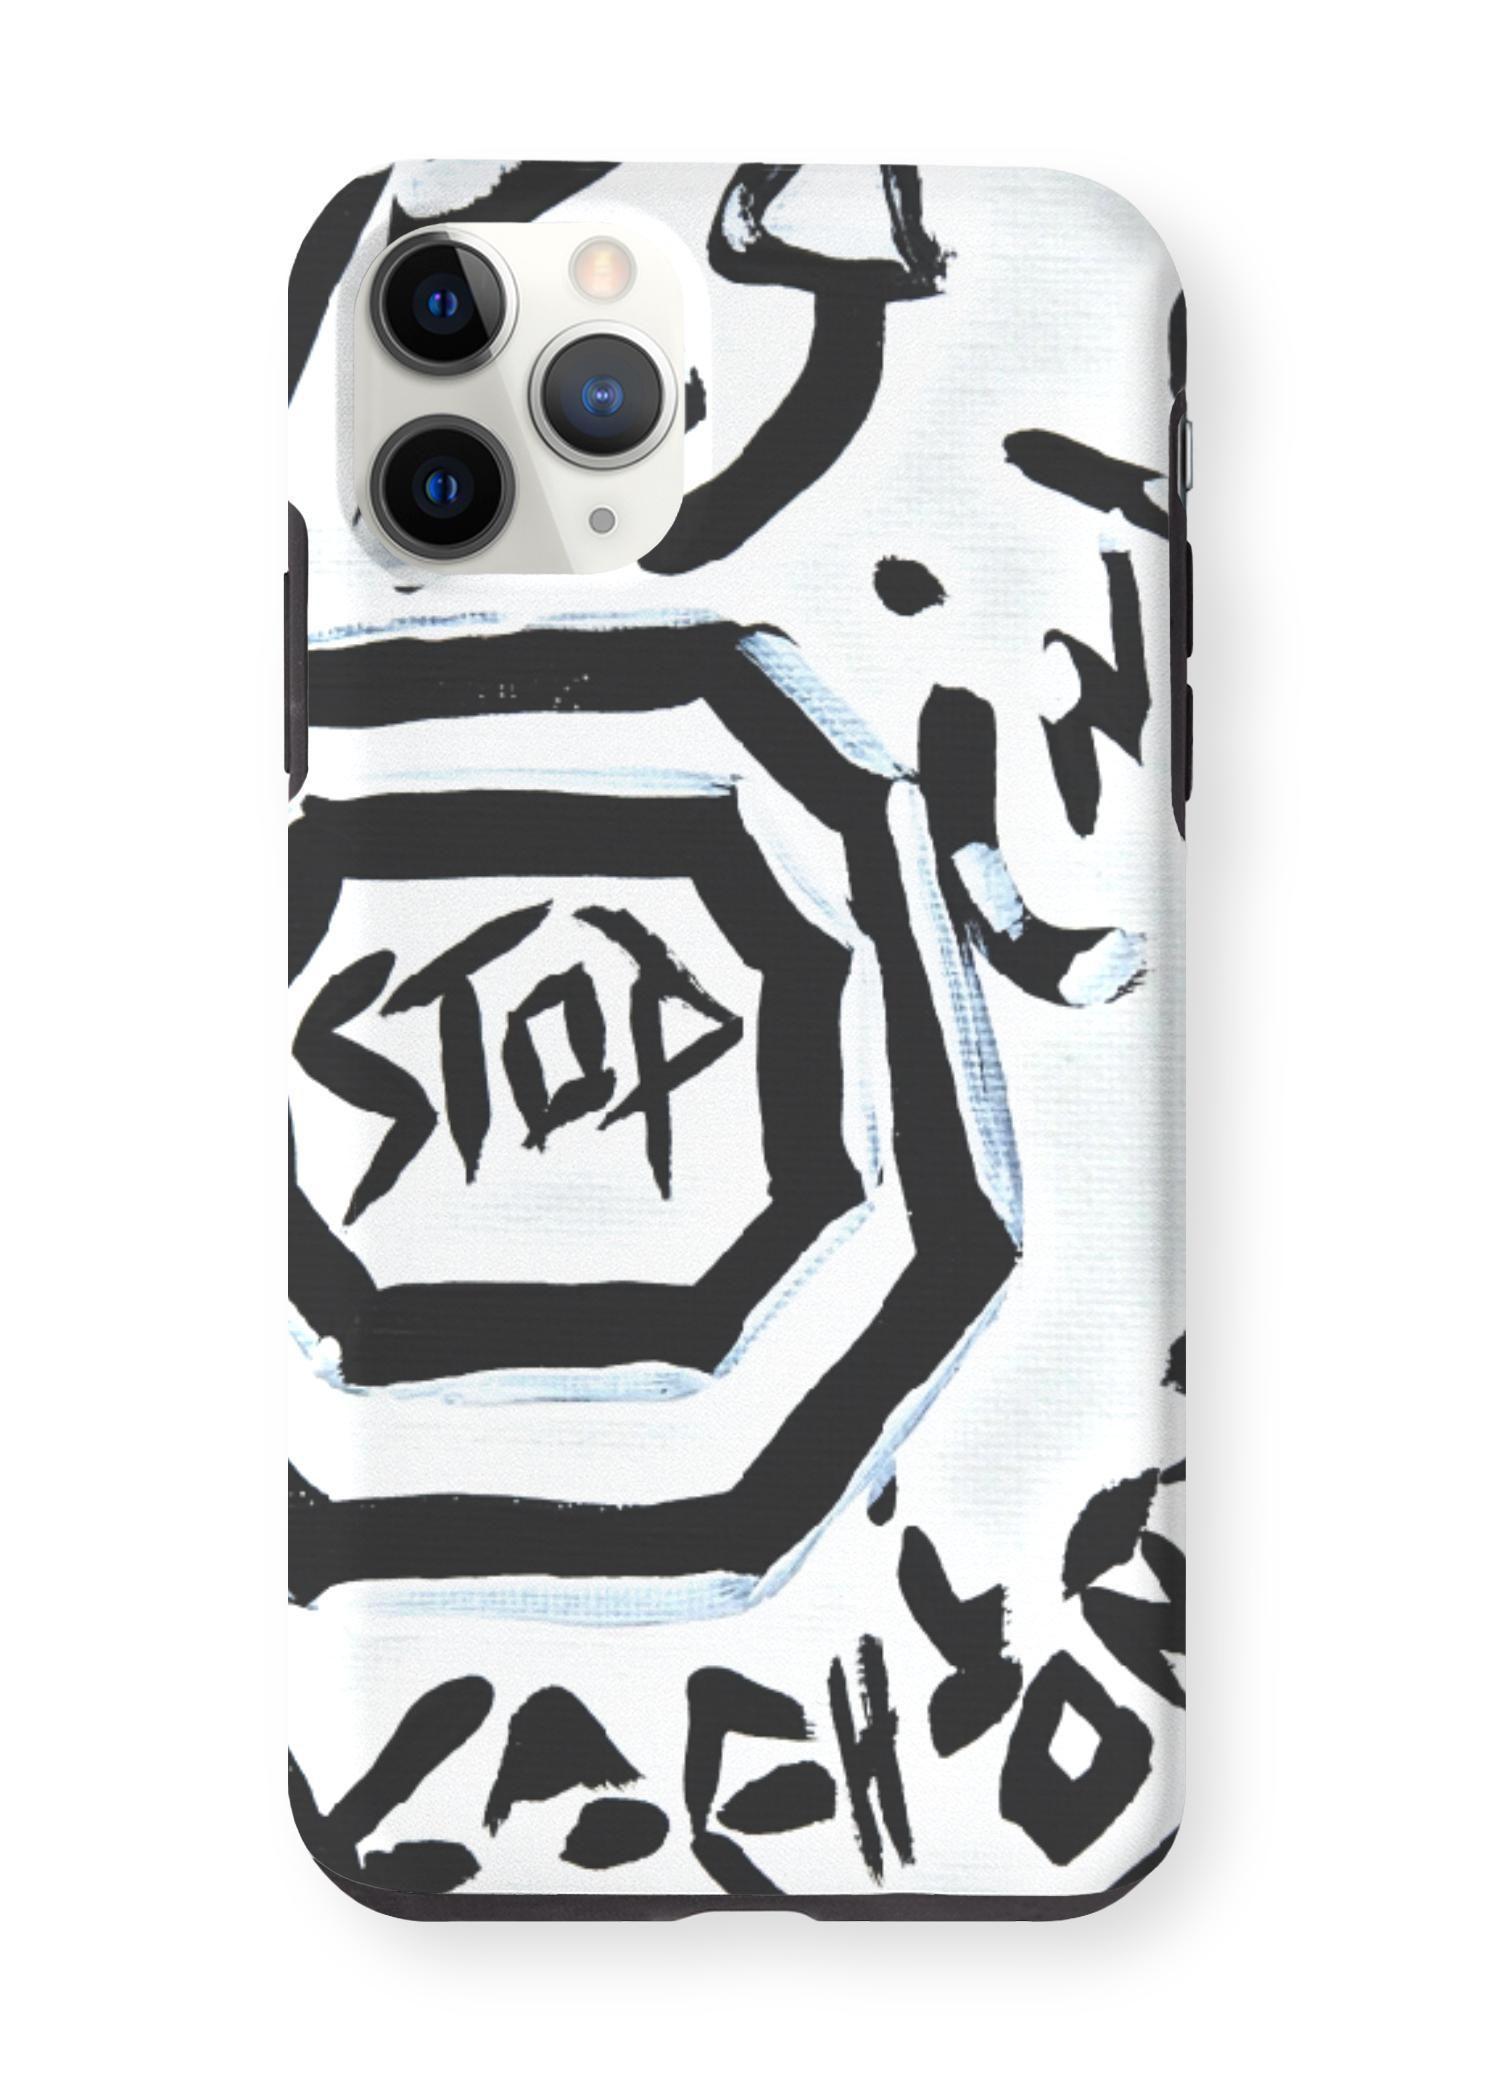 Black chaos iphone case by riecee siren cheap phone